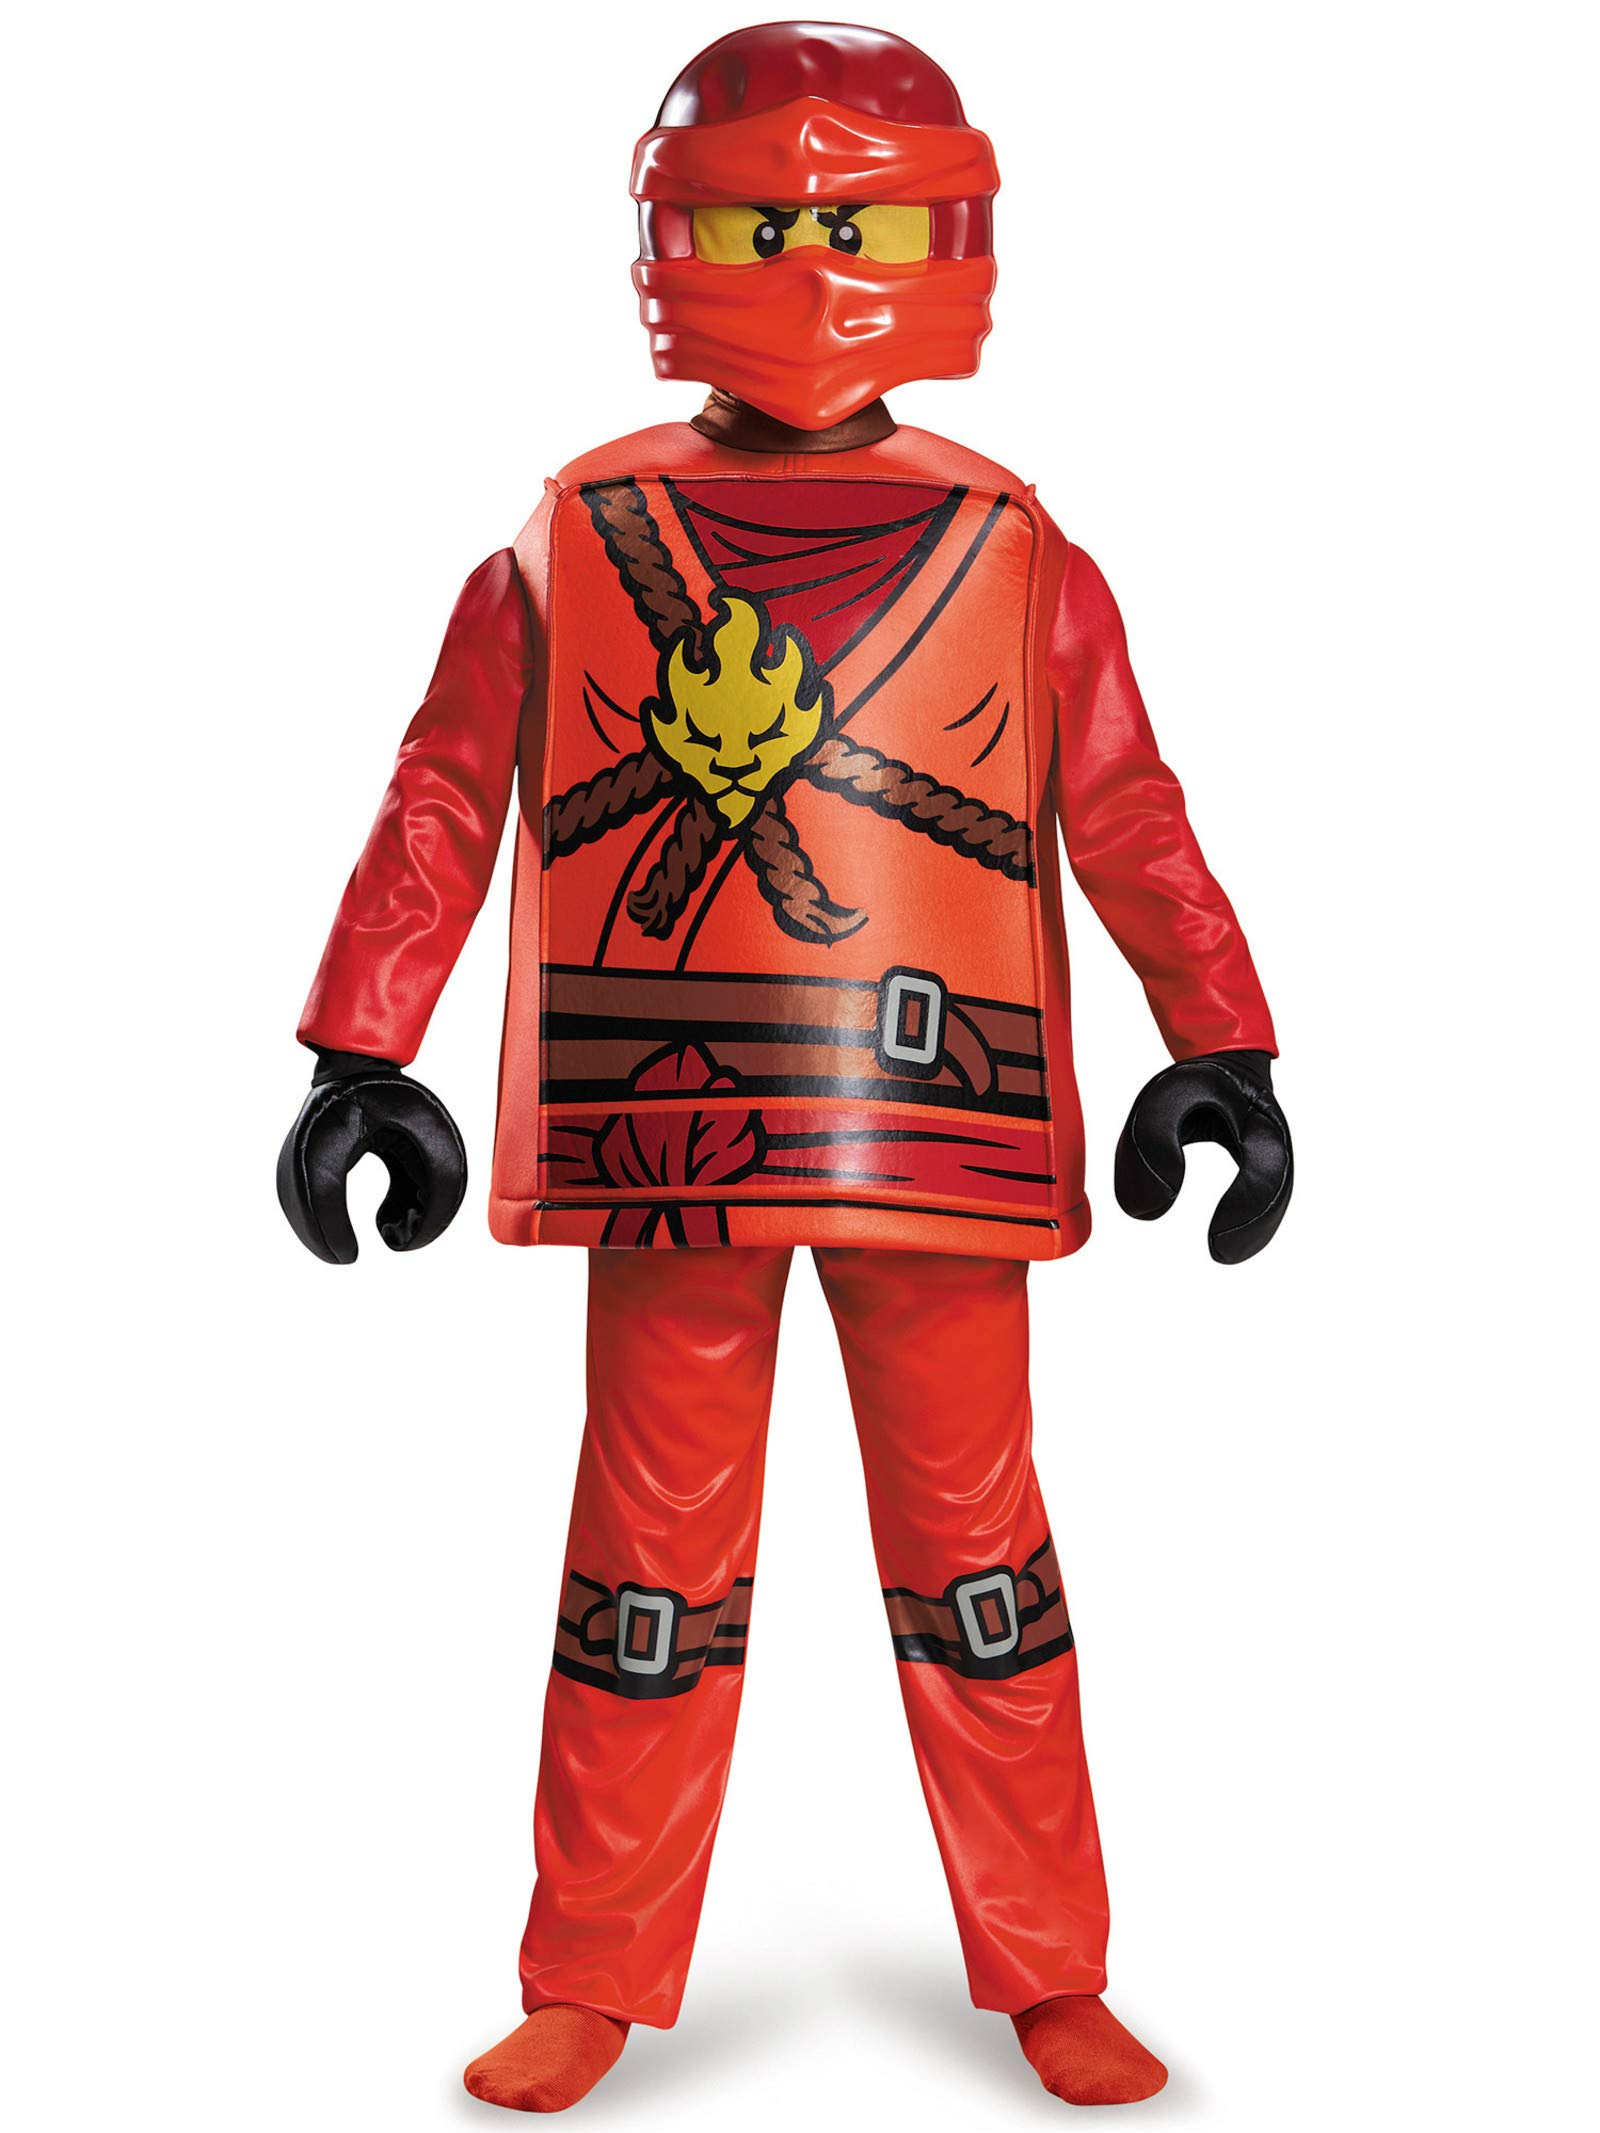 Disguise Kai Deluxe Ninjago Lego Costume, Medium/7-8 by Disguise